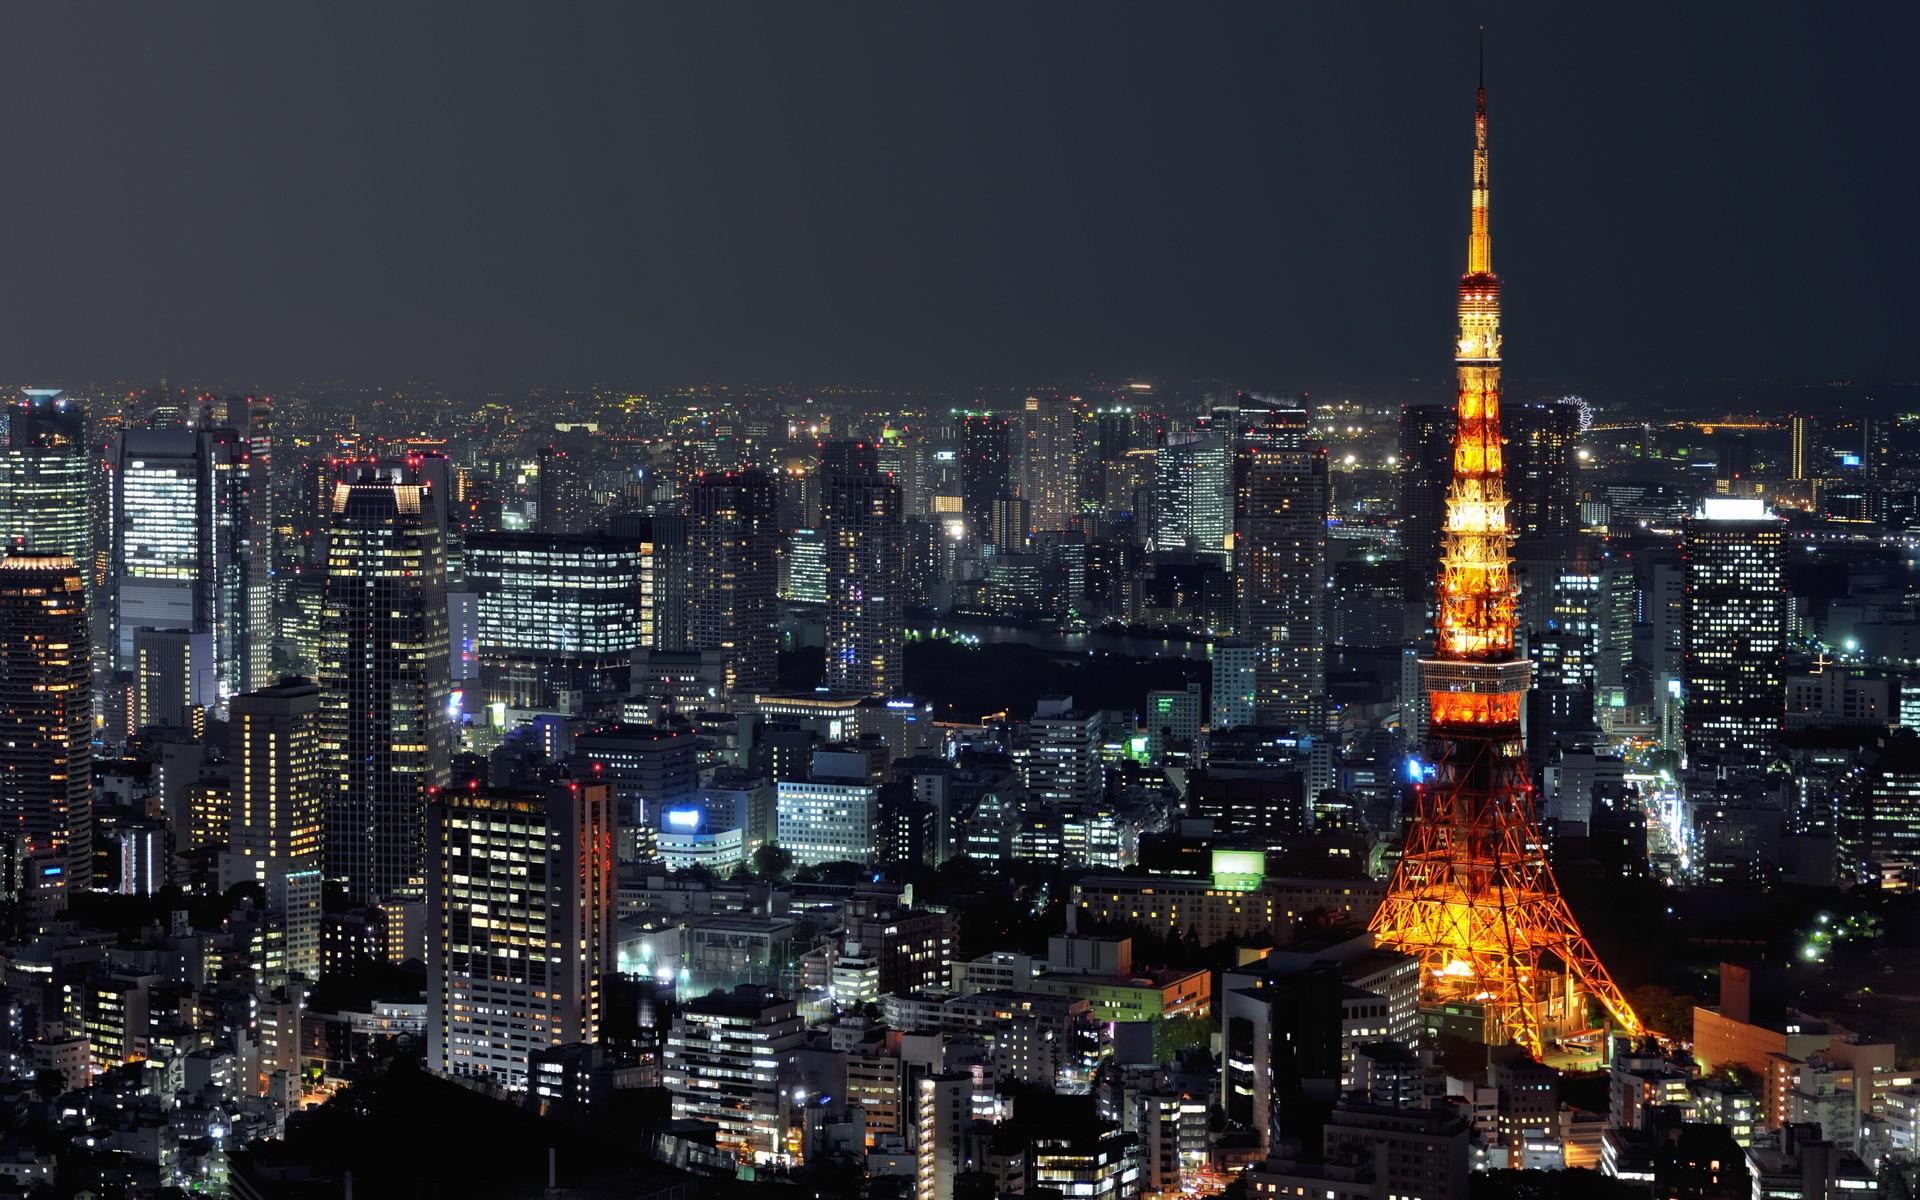 Japan Tokyo Wallpaper 1920x1200 Japan Tokyo Cityscapes Night 1920x1200